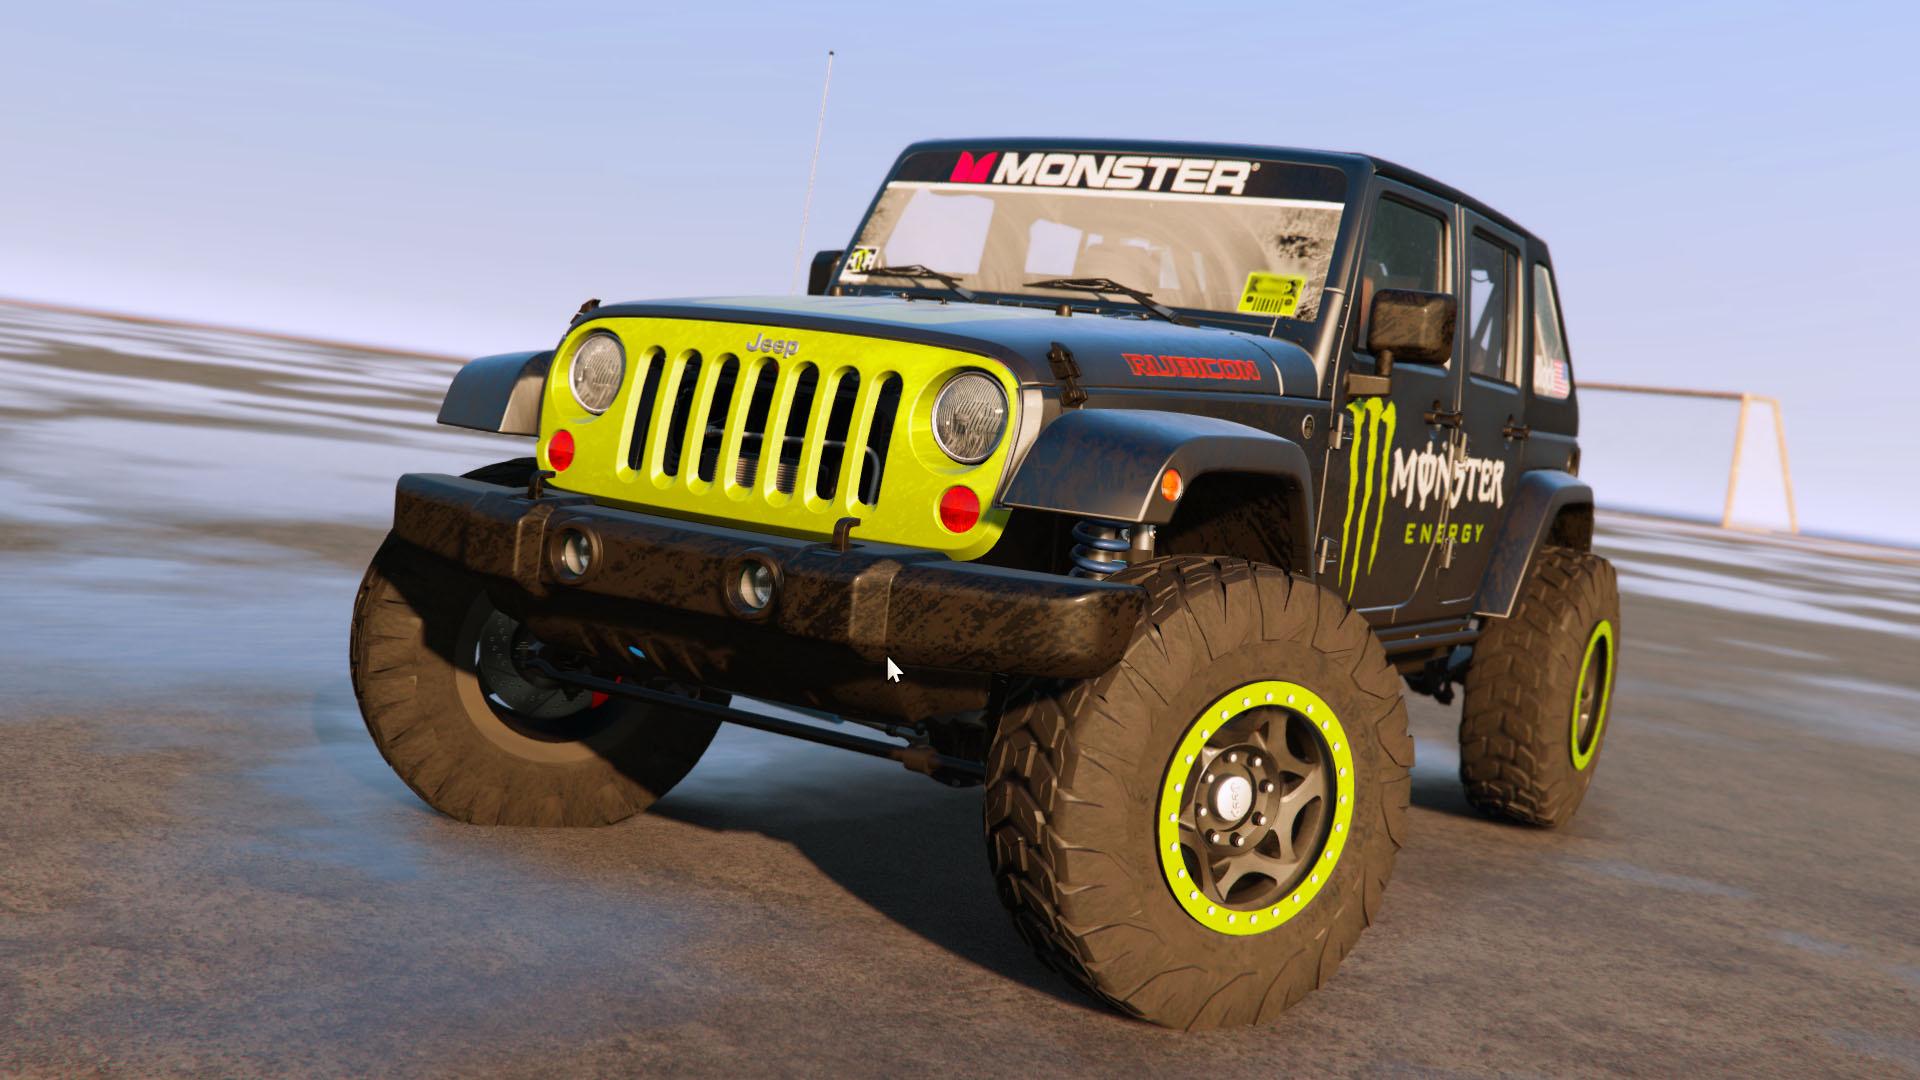 Jeep Wrangler 2012 Rubicon Monster livery GTA5 Mods